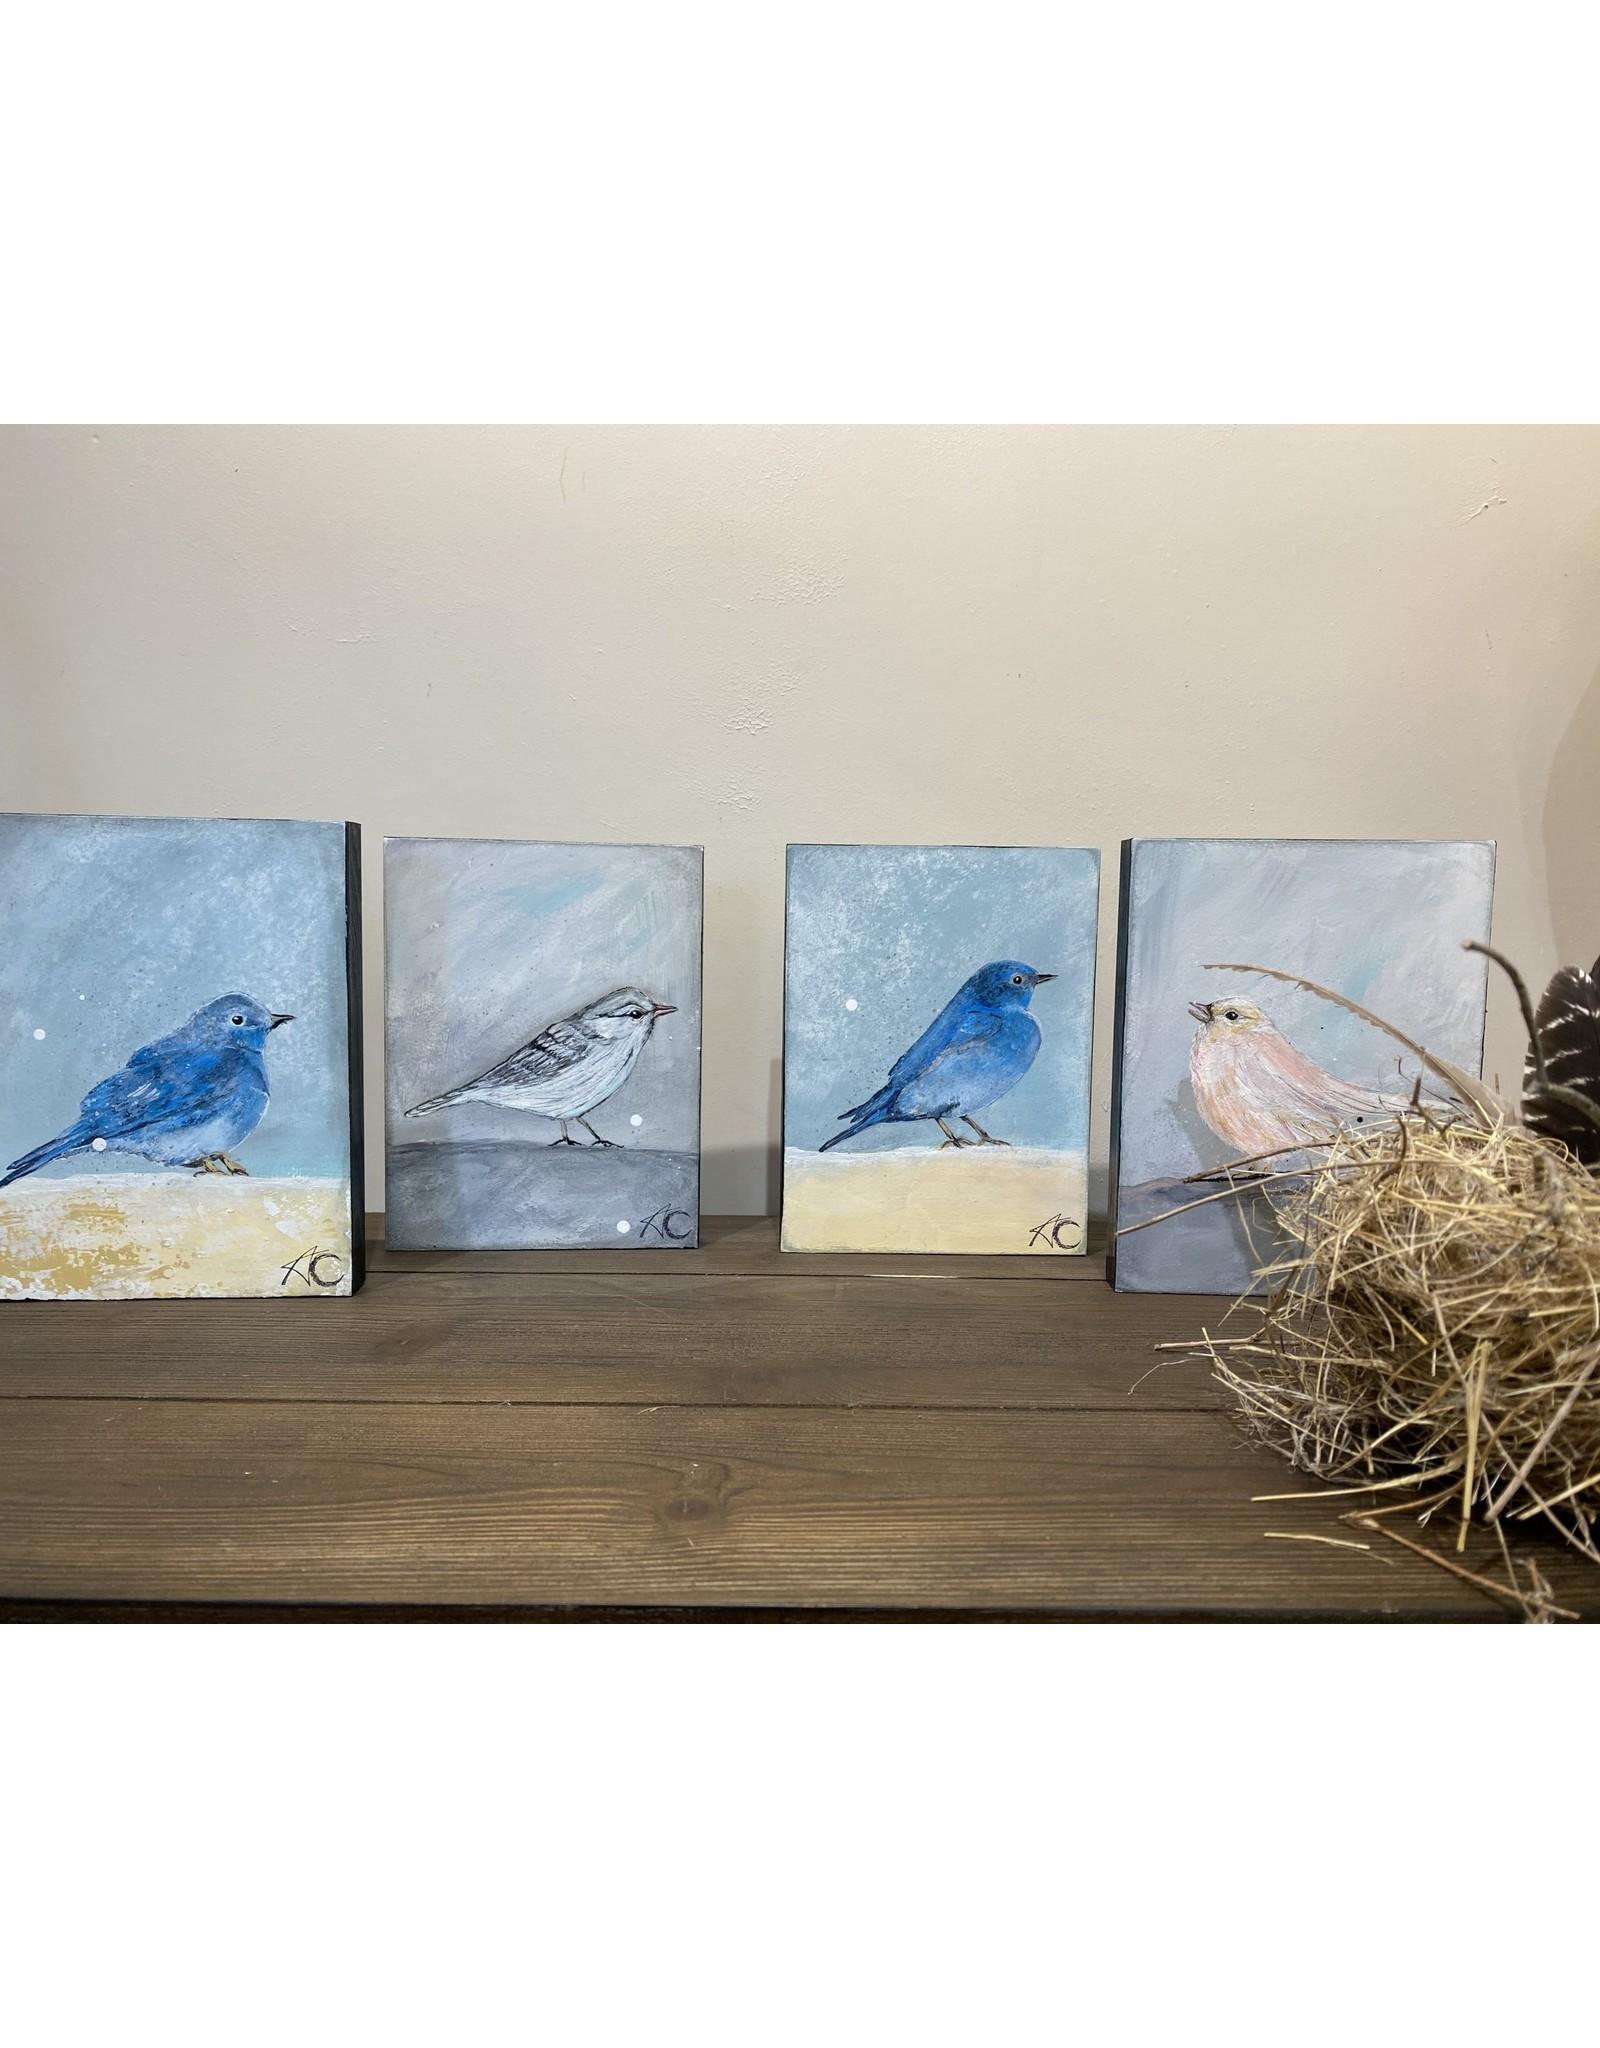 Annette Colby - Painter Wonderland - Annette Colby